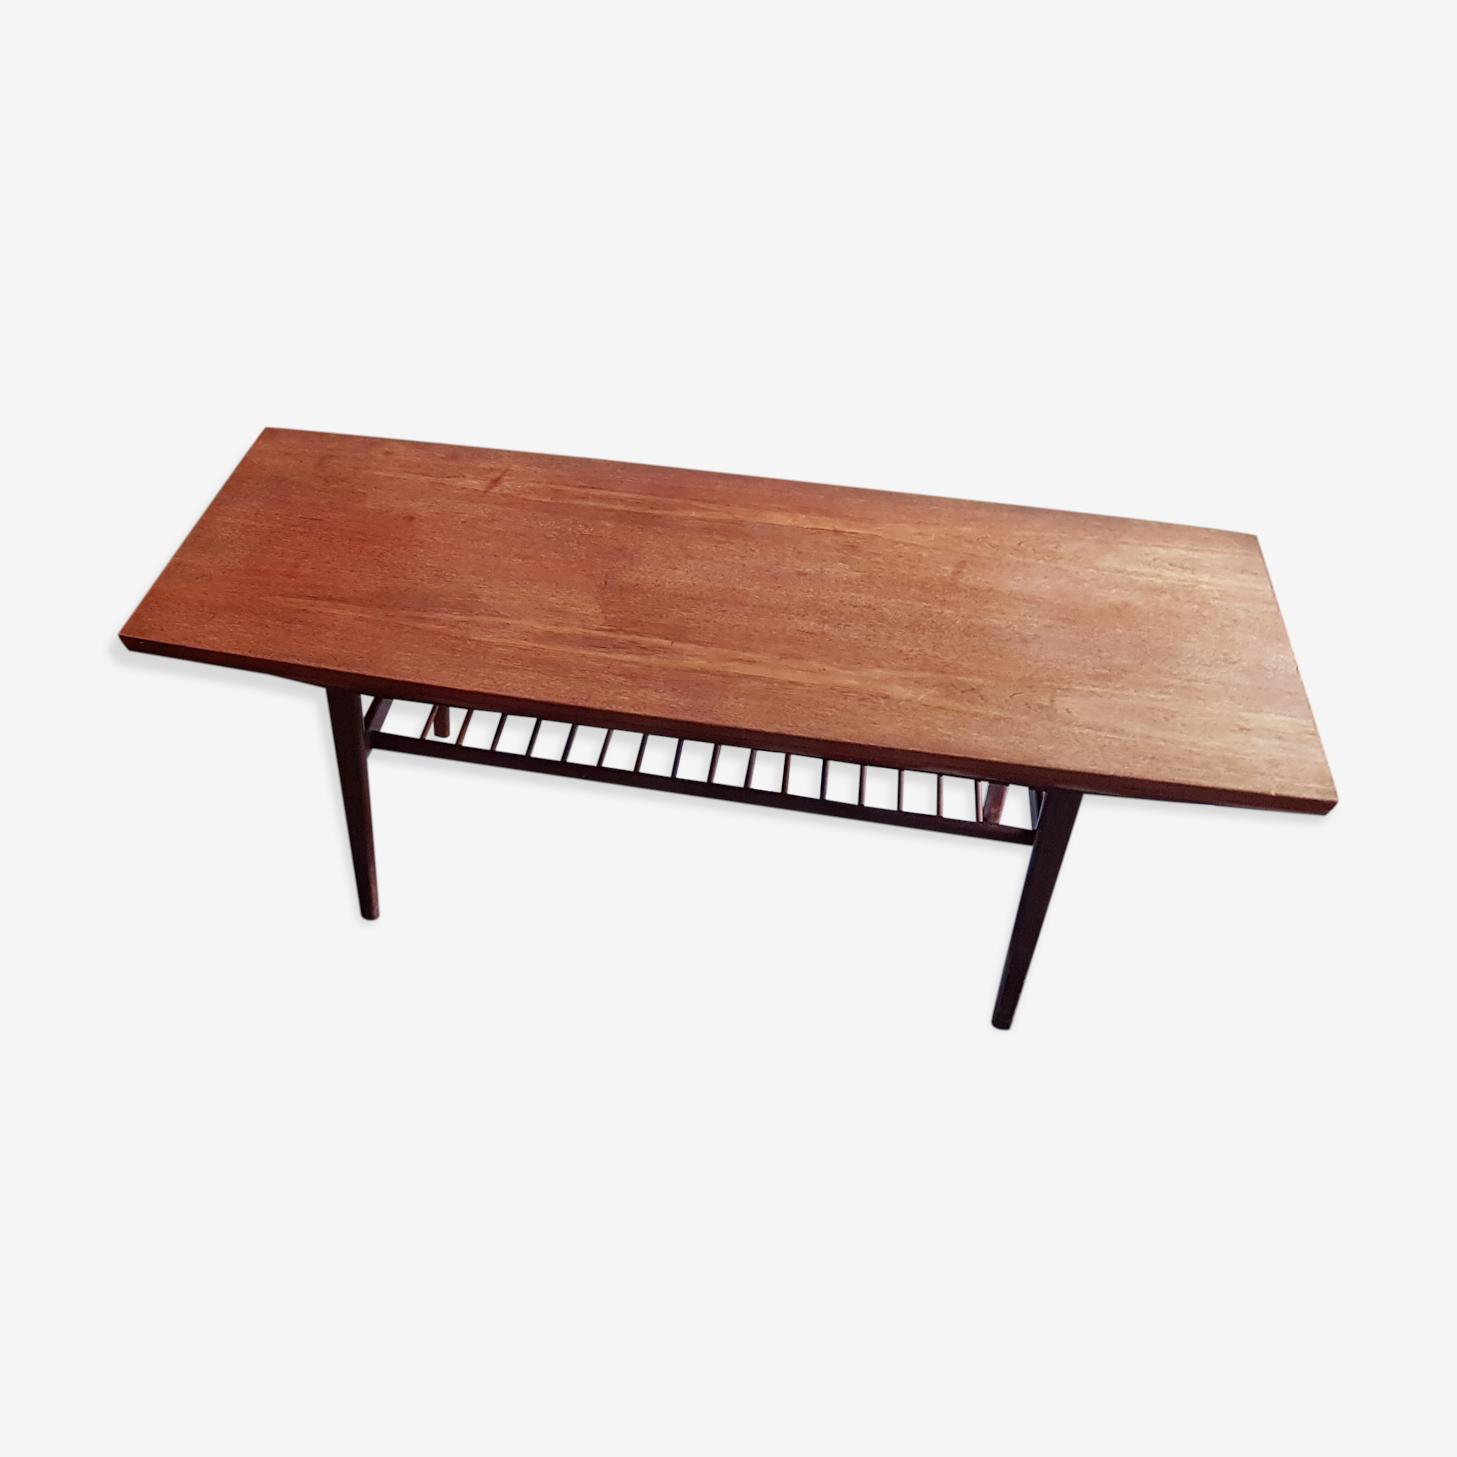 Scandinavian teak coffee table, ' 60s, 2 embedded extensions.